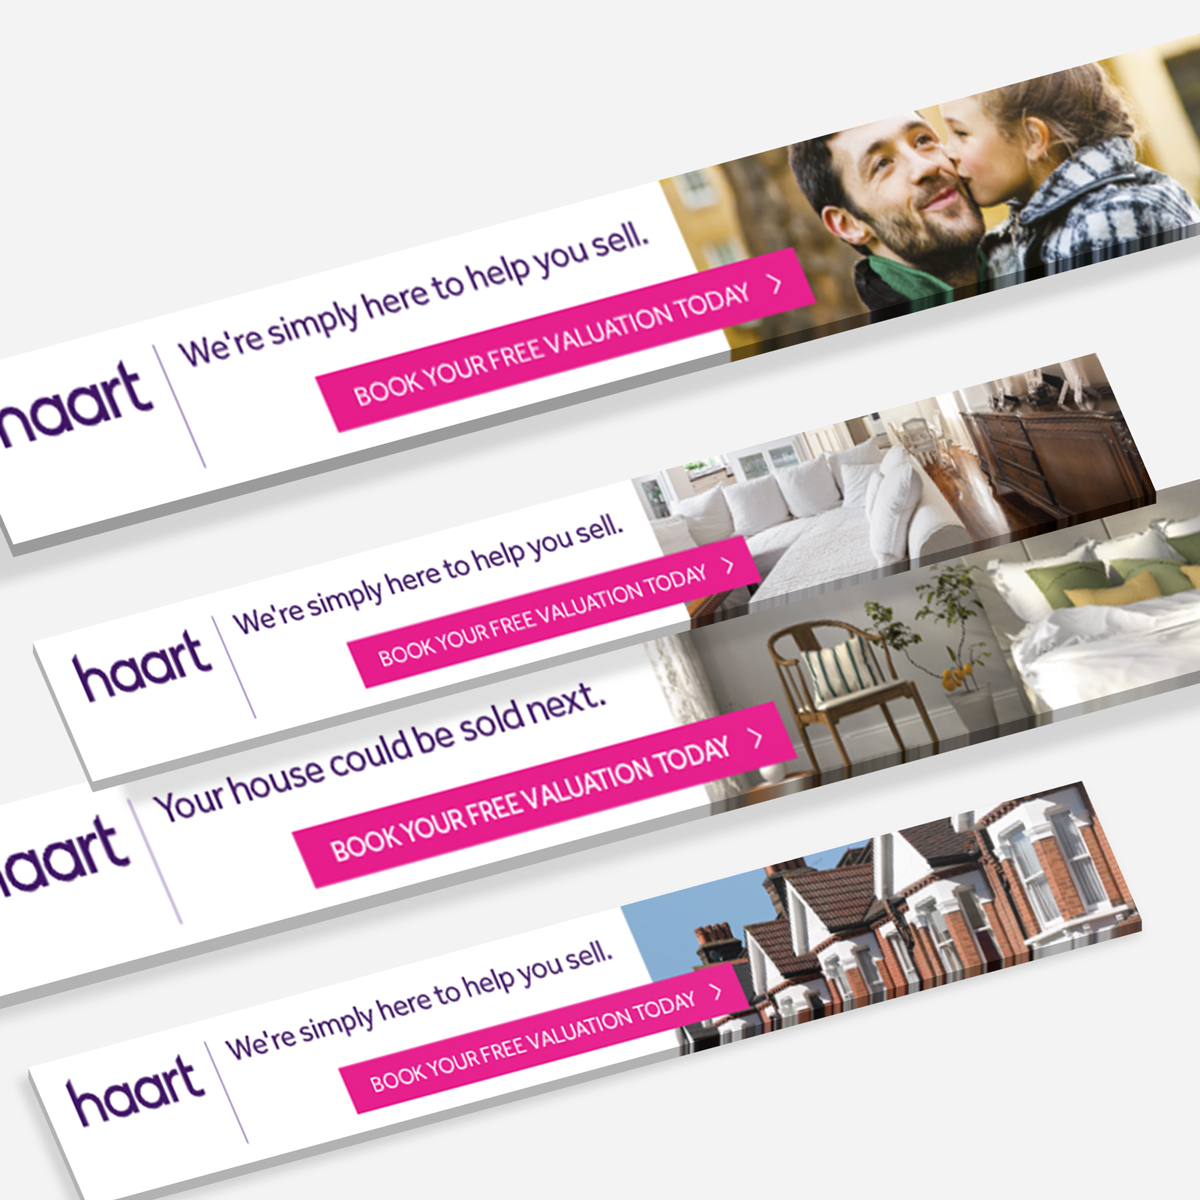 Display ads: Haart